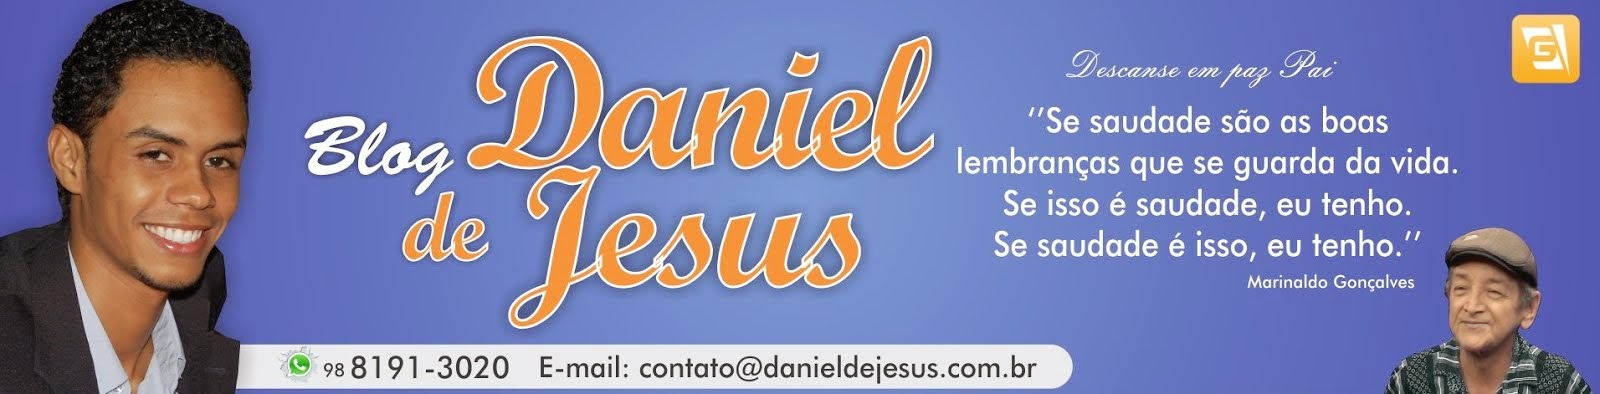 Daniel de Jesus